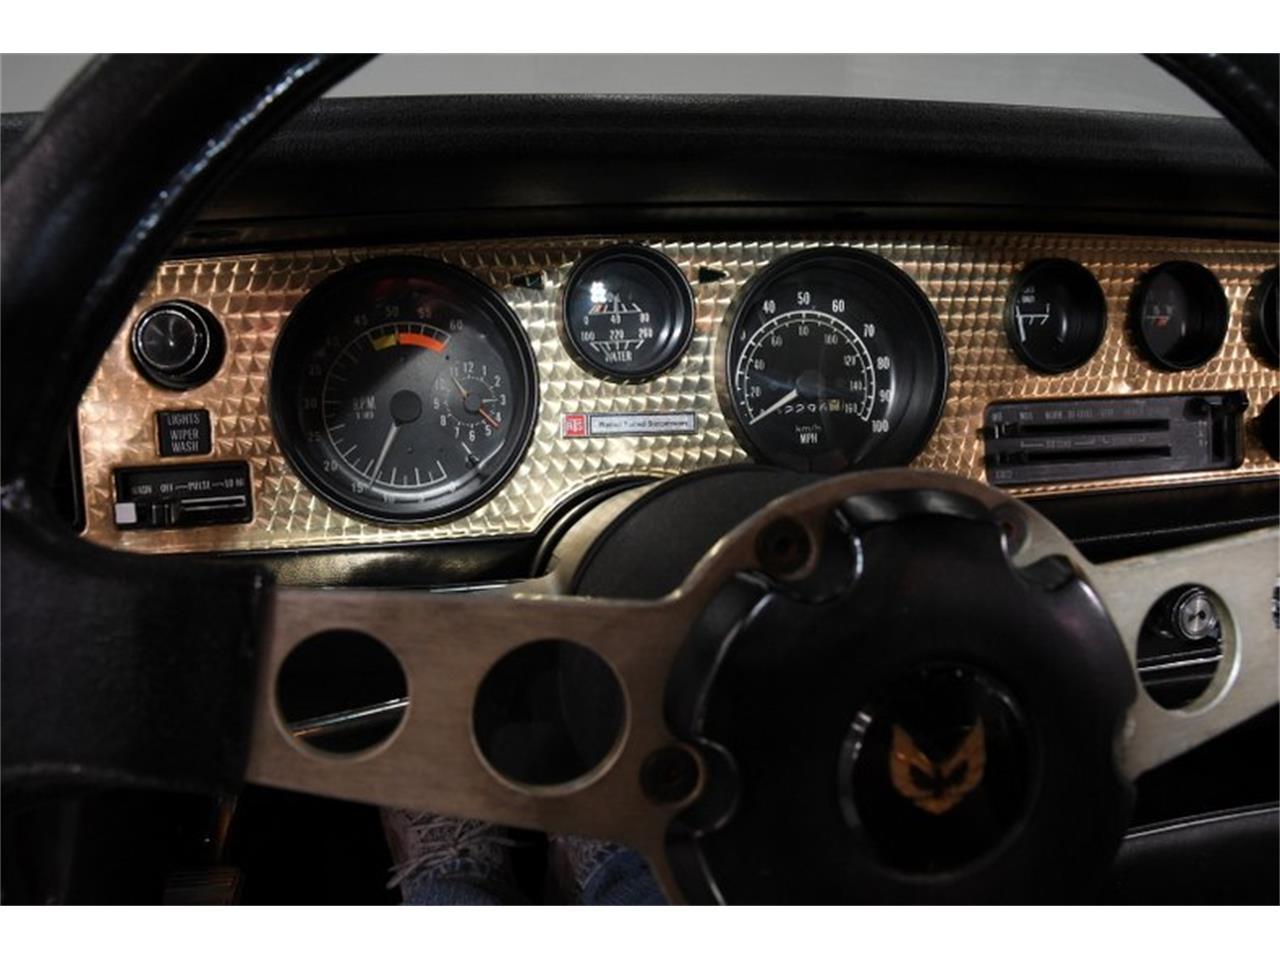 For Sale: 1979 Pontiac Firebird Trans Am in Volo, Illinois